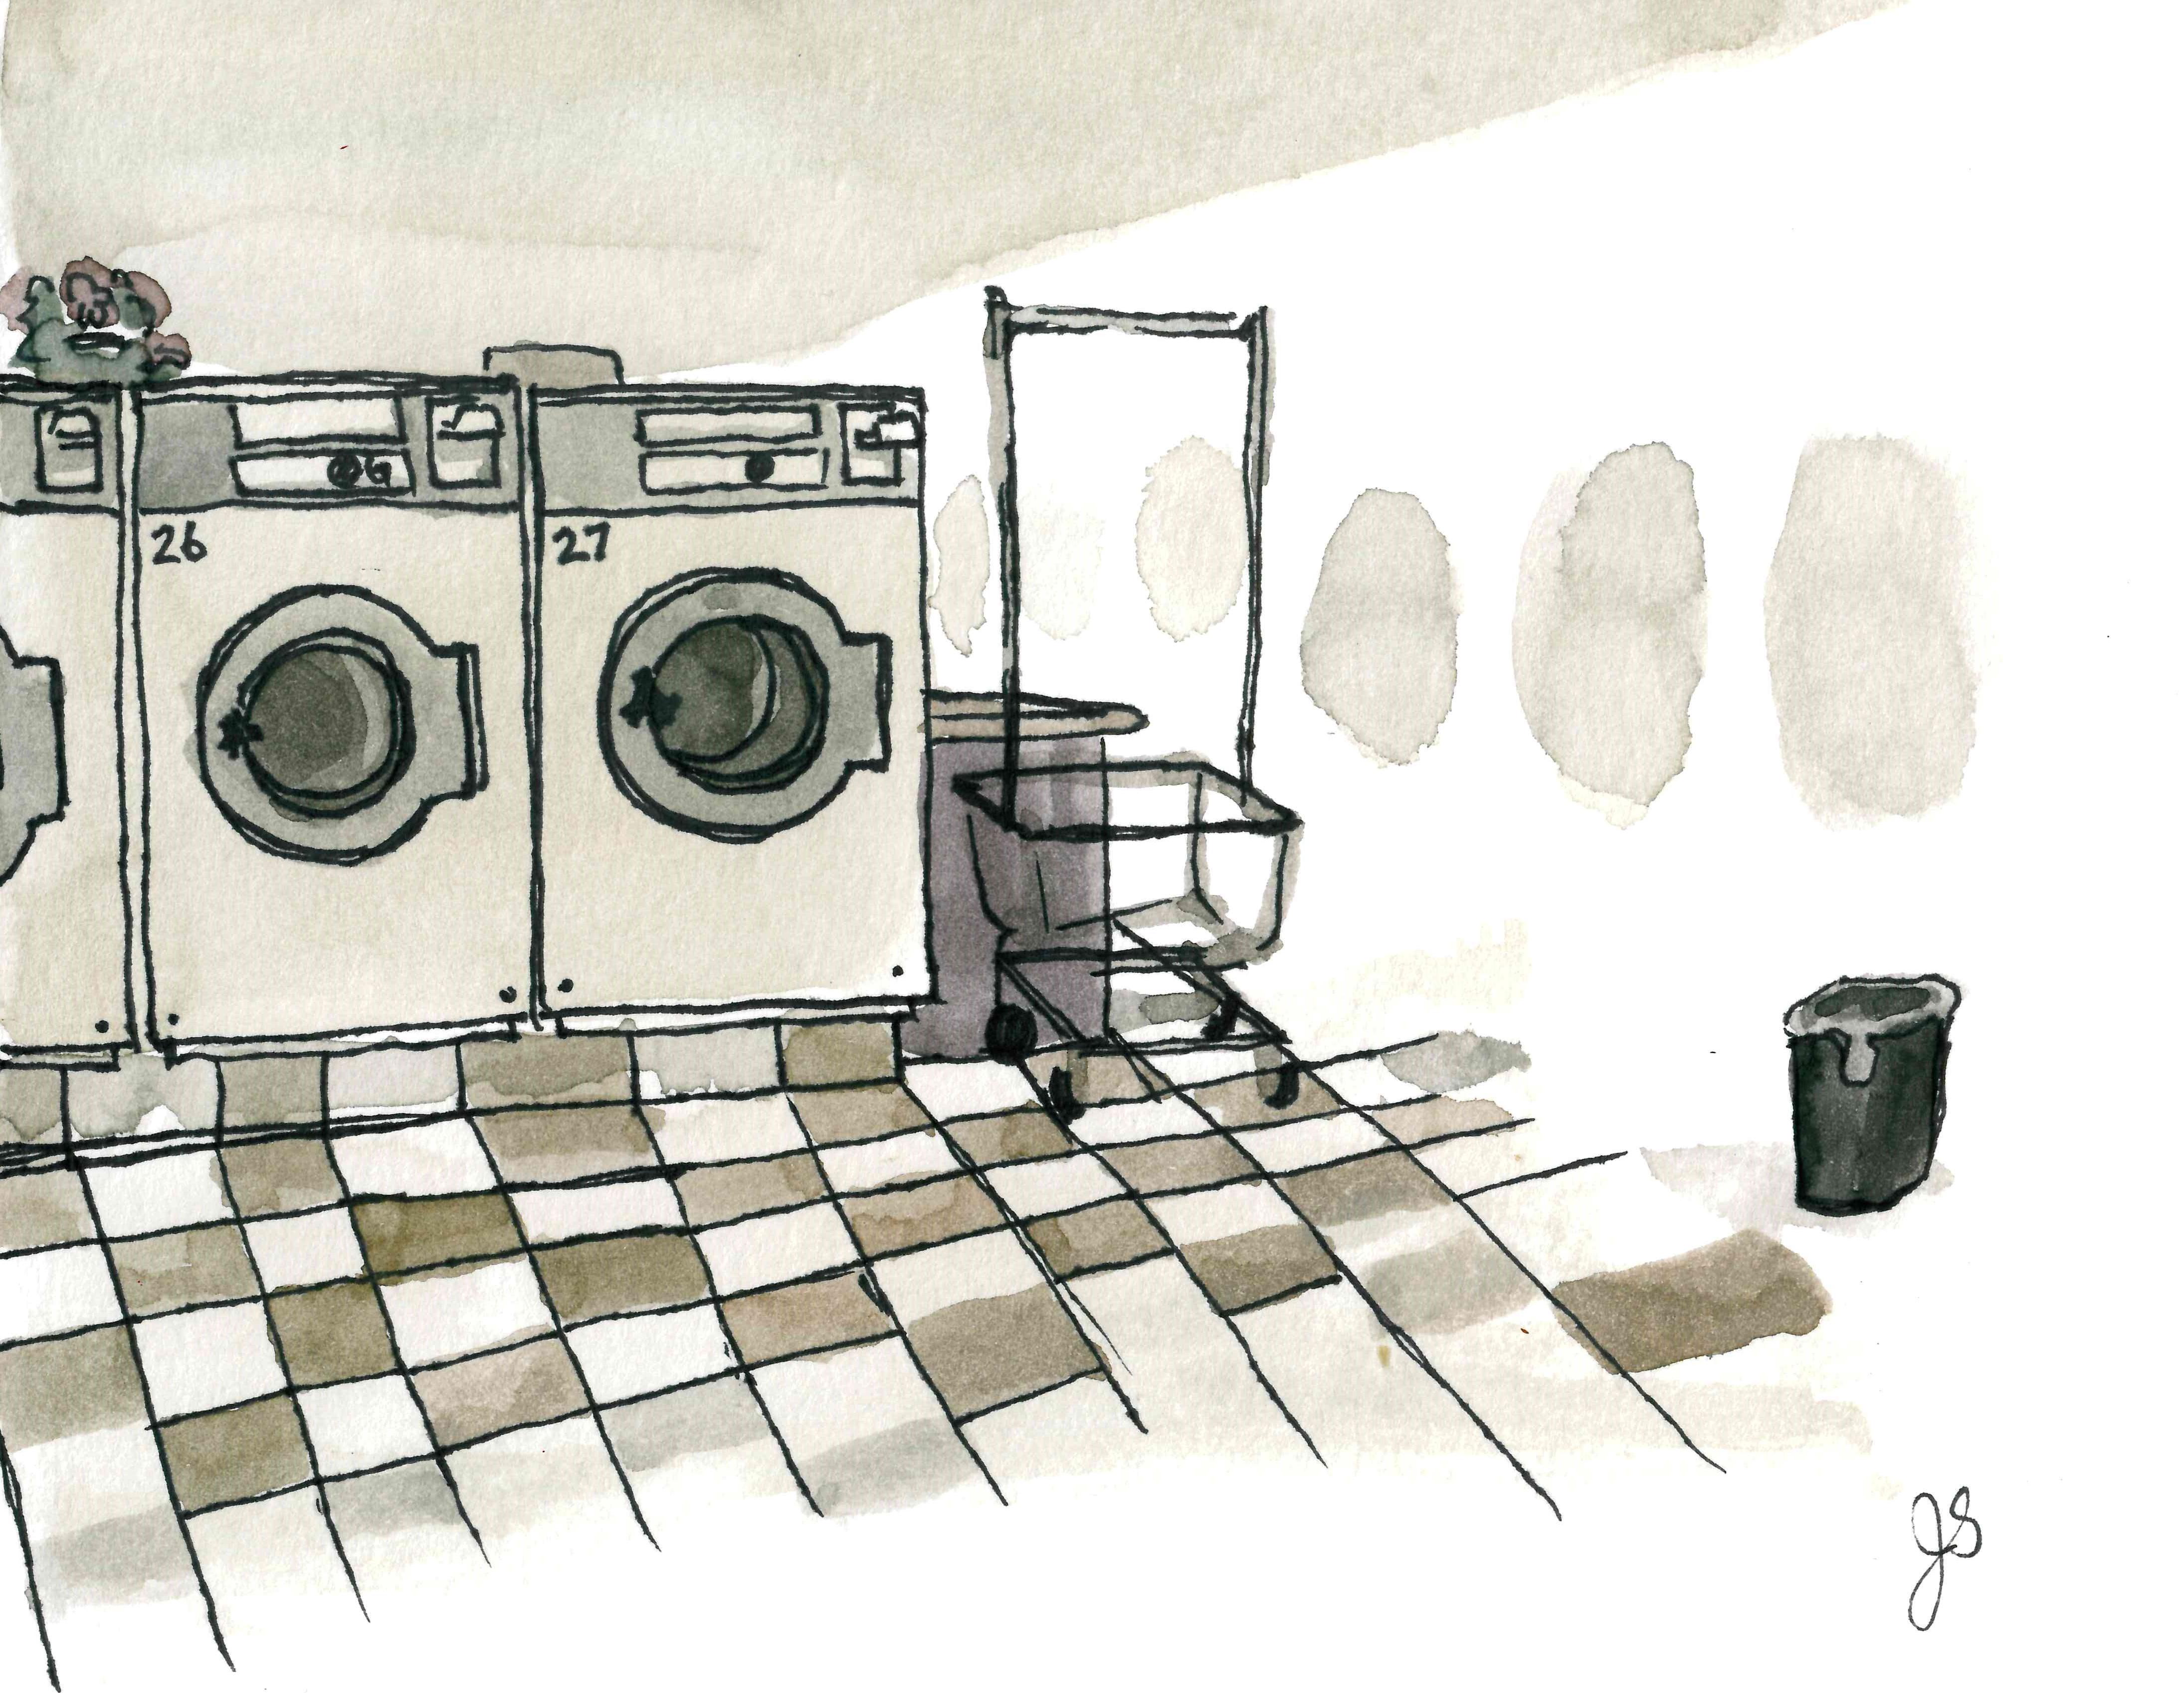 Toronto Laundromat 4x6 2017